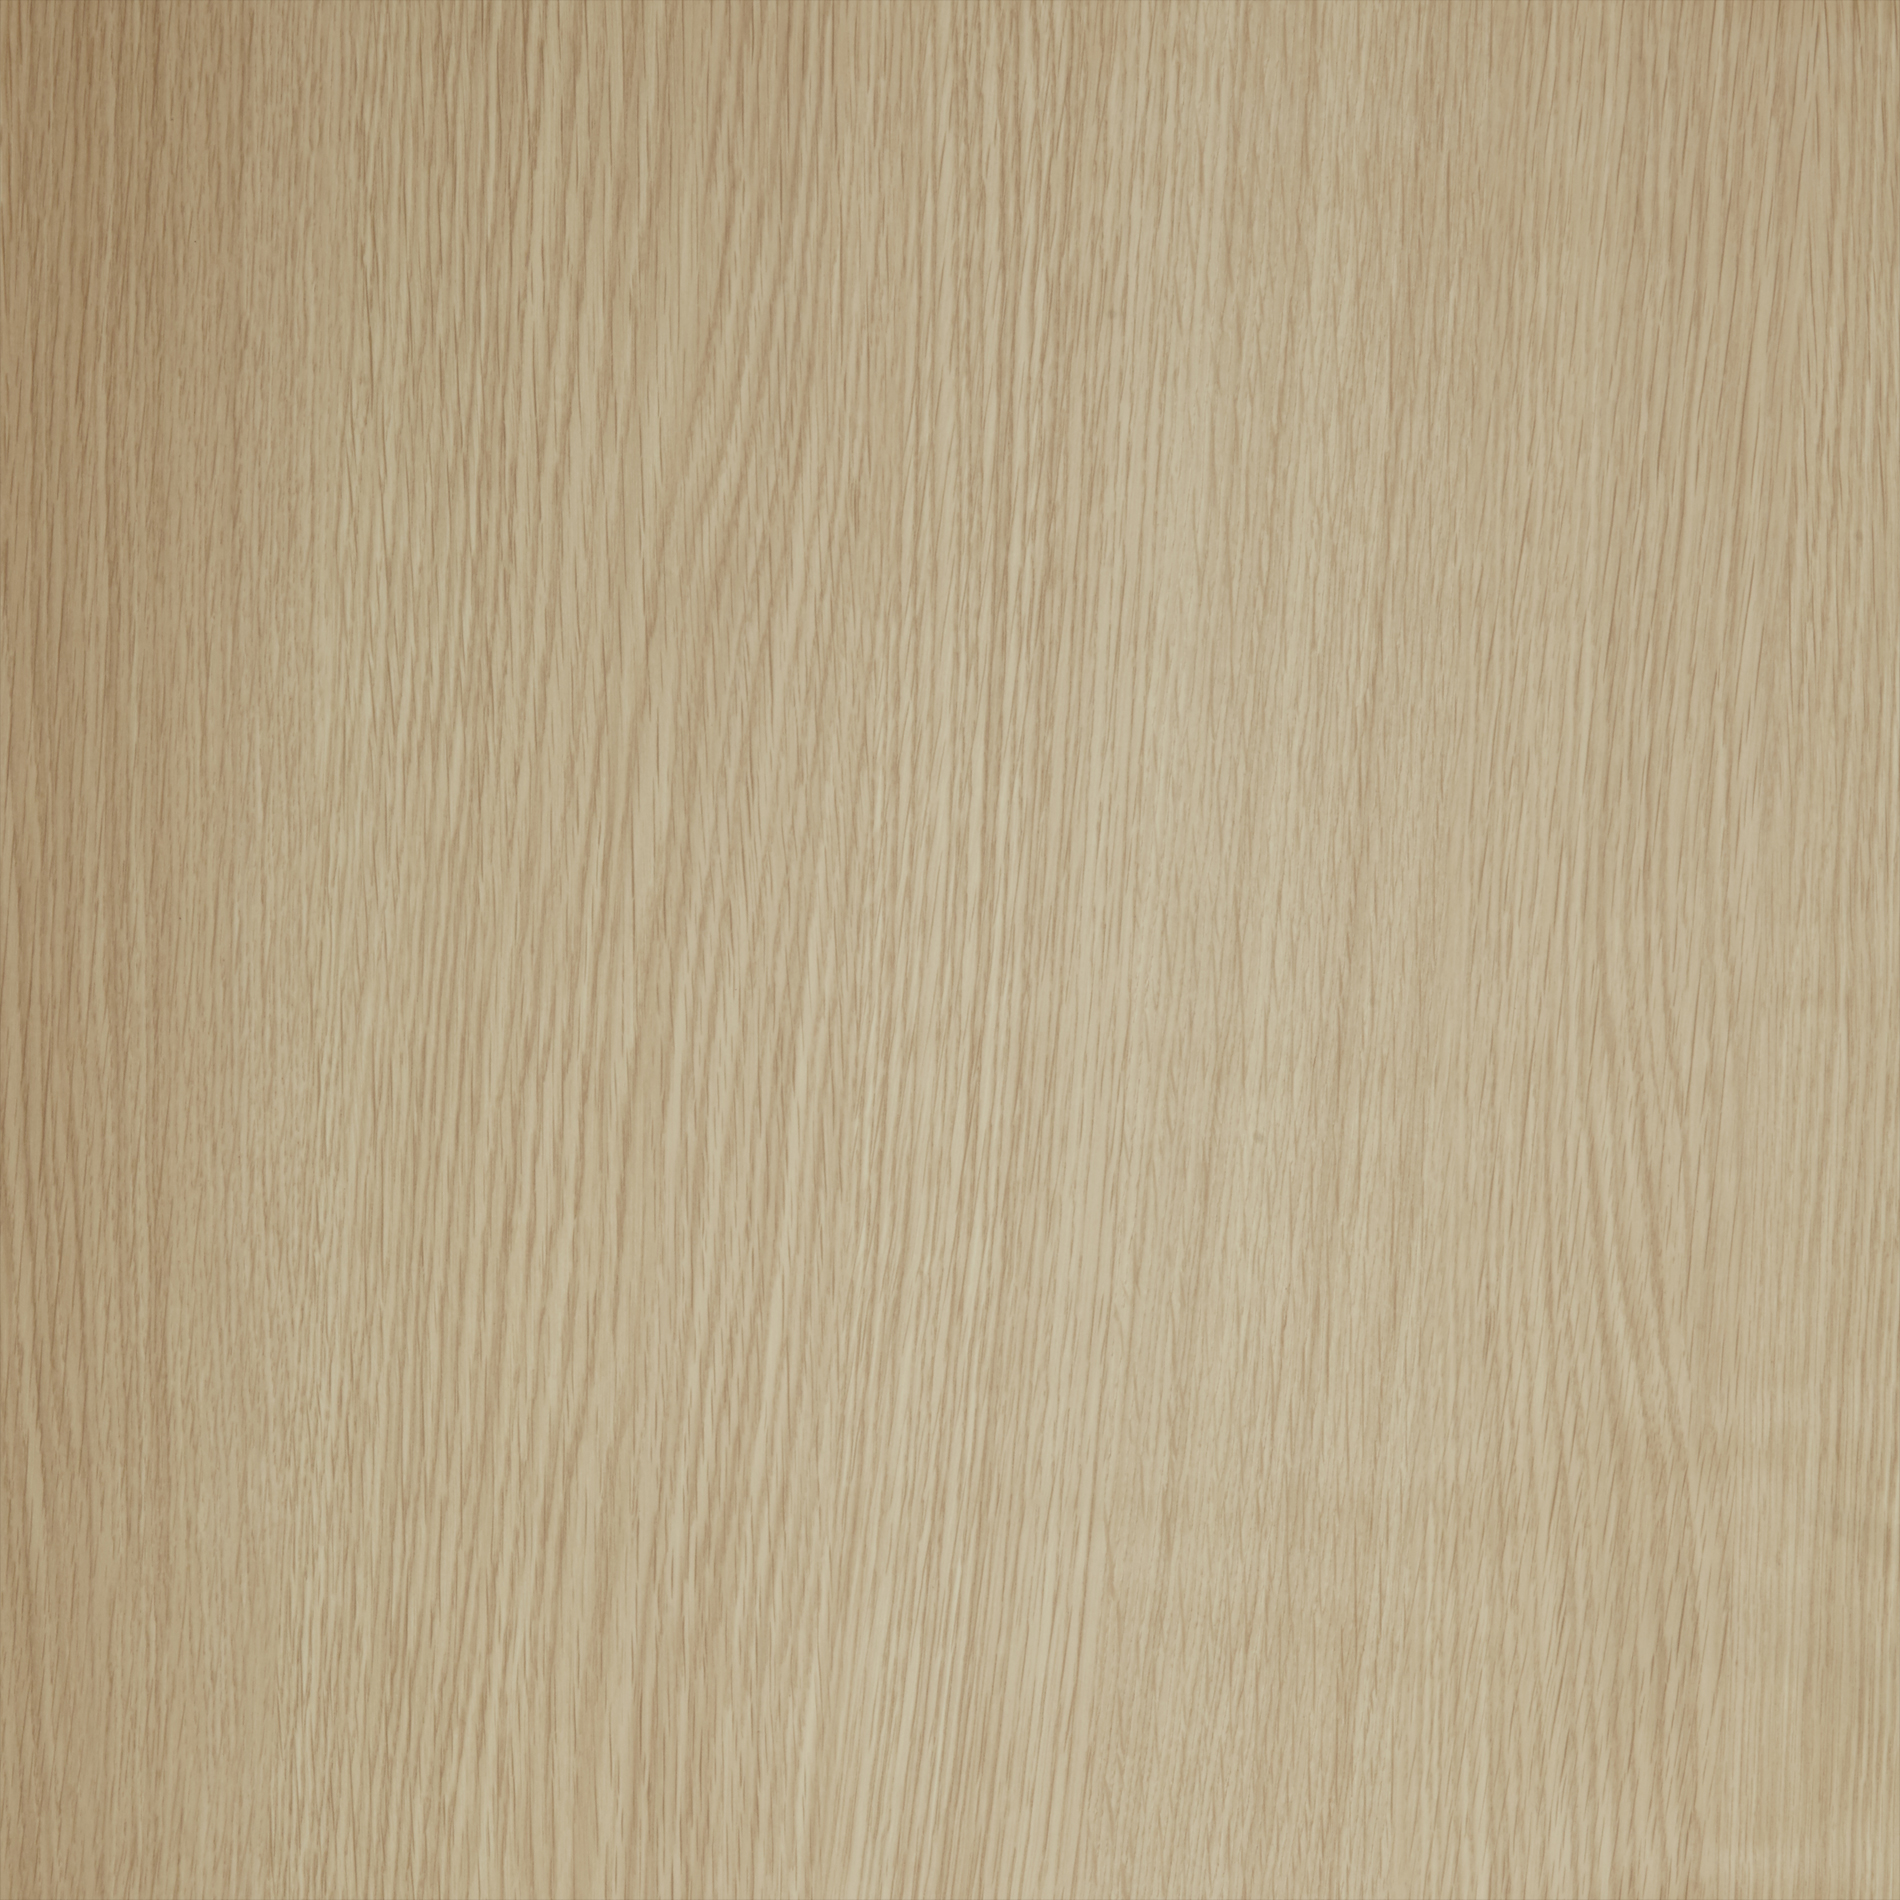 Sculptform White Oak TLW